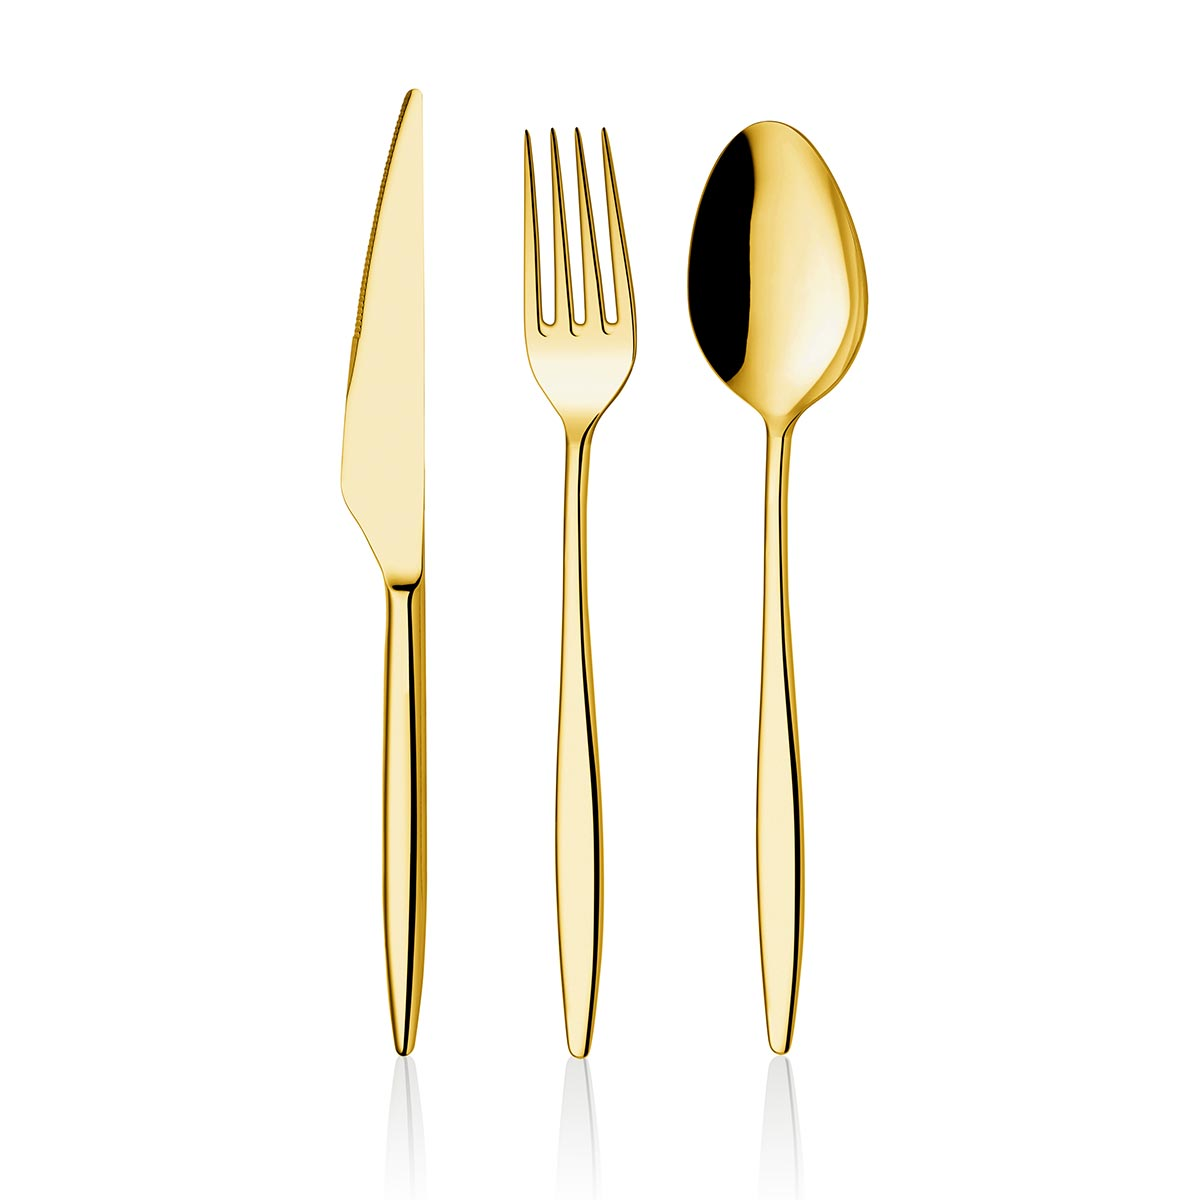 ONON Assos Altın Titanyum 89 Parça Çatal Kaşık Bıçak Takımı Kutu 1